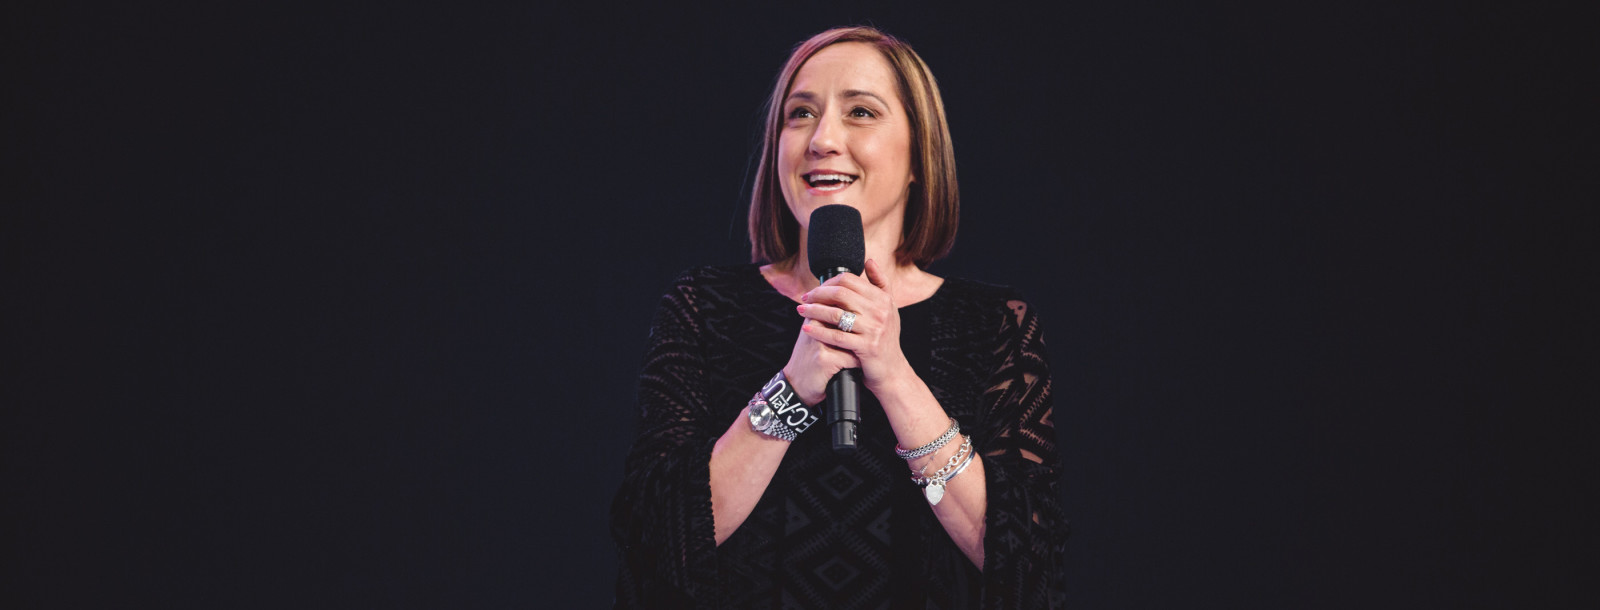 Christine Caine, A21 Campaign Founder